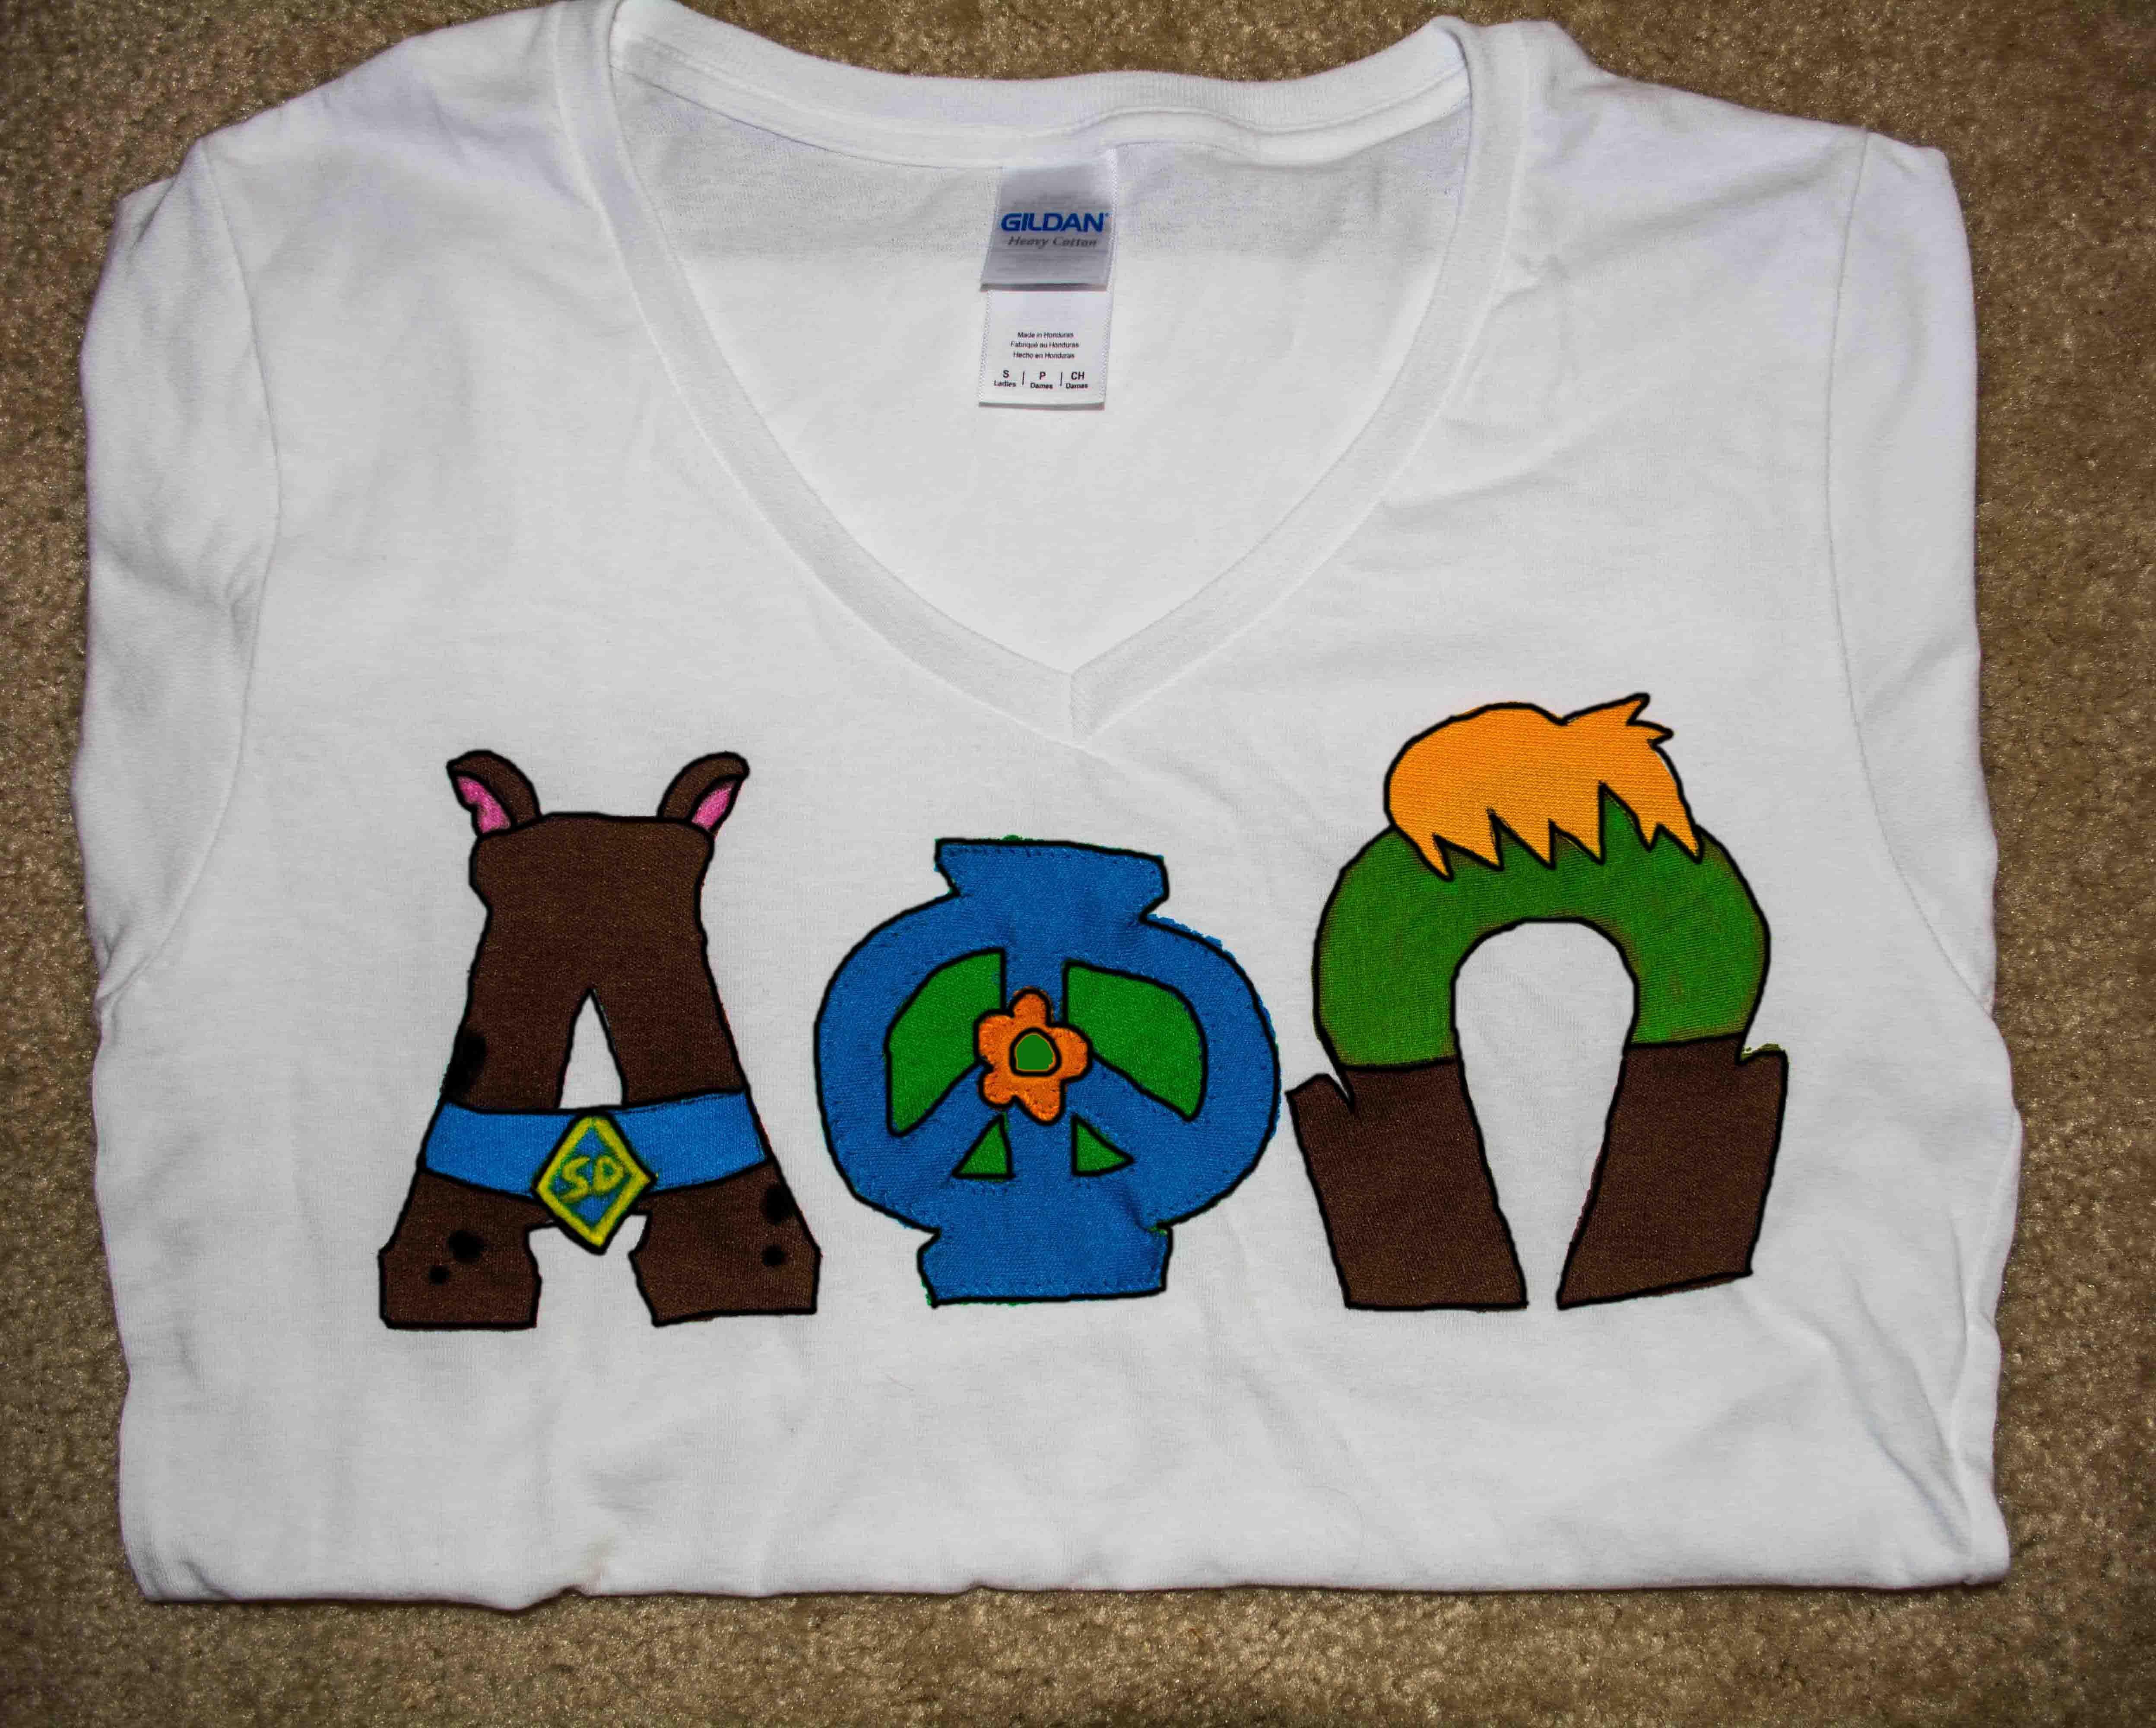 Scooby Doo APO letters Greek Letters by Me Pinterest